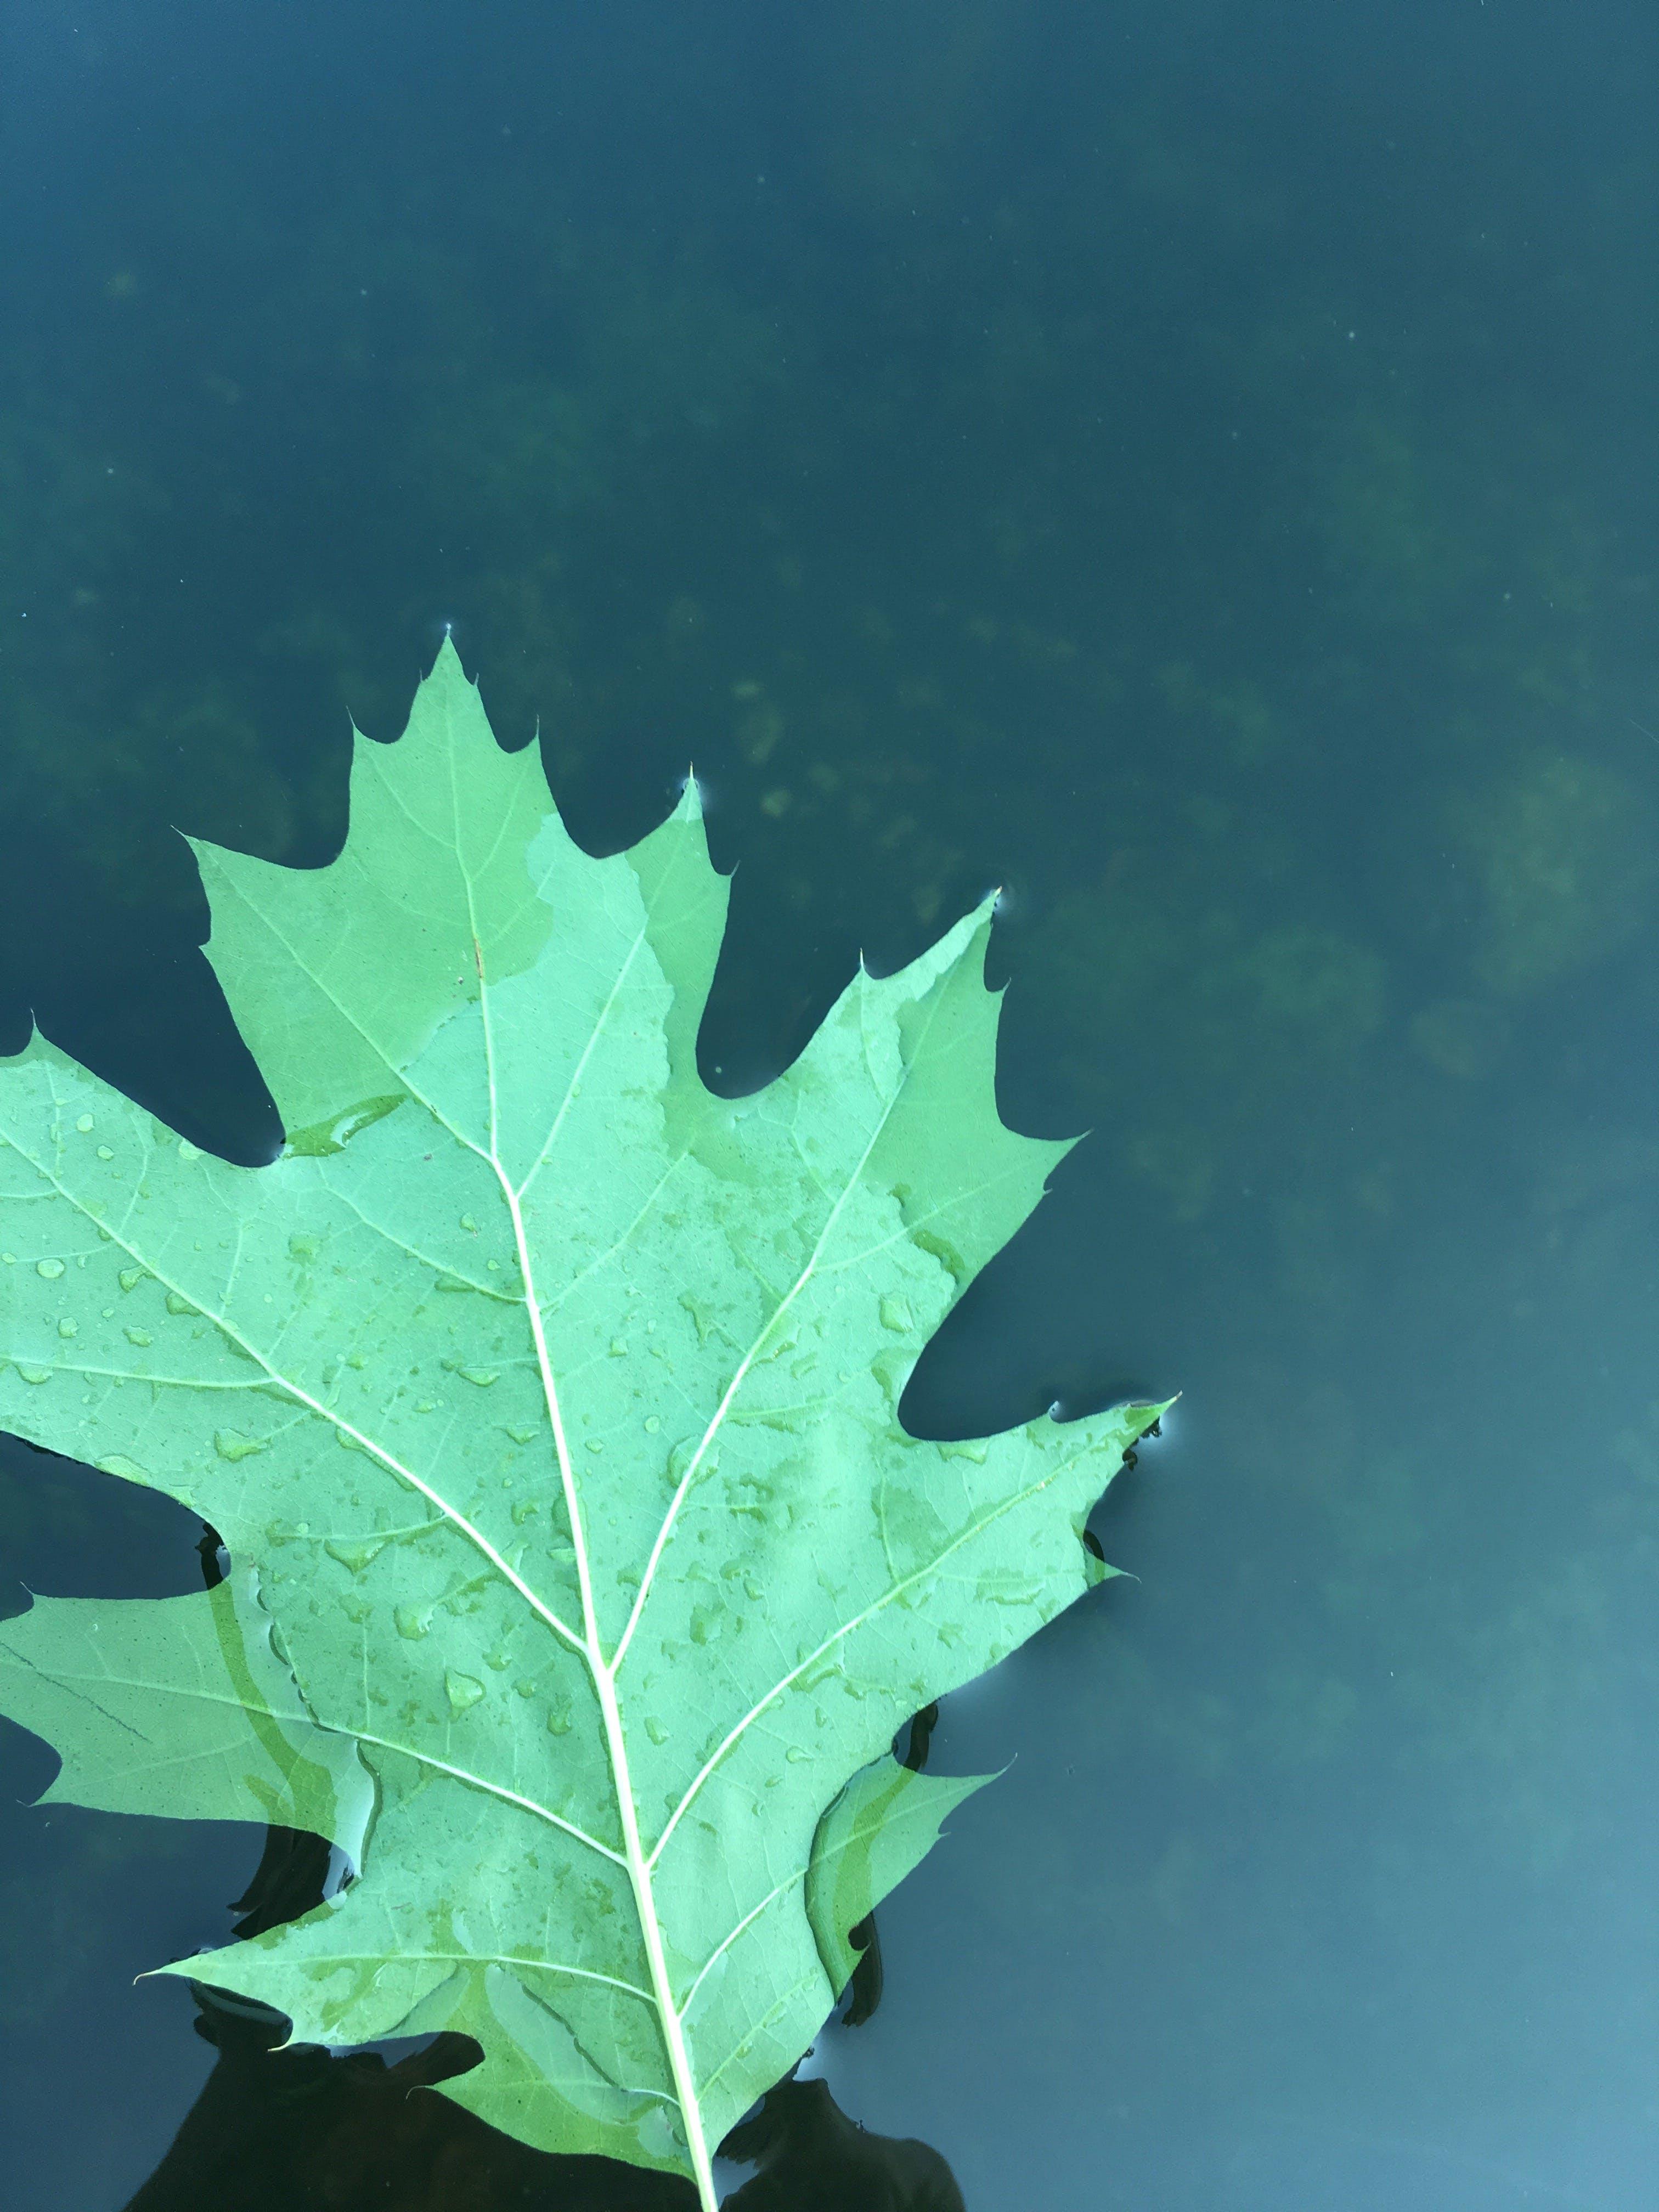 Free stock photo of Big leaf, calm waters, glassy water, green leaf